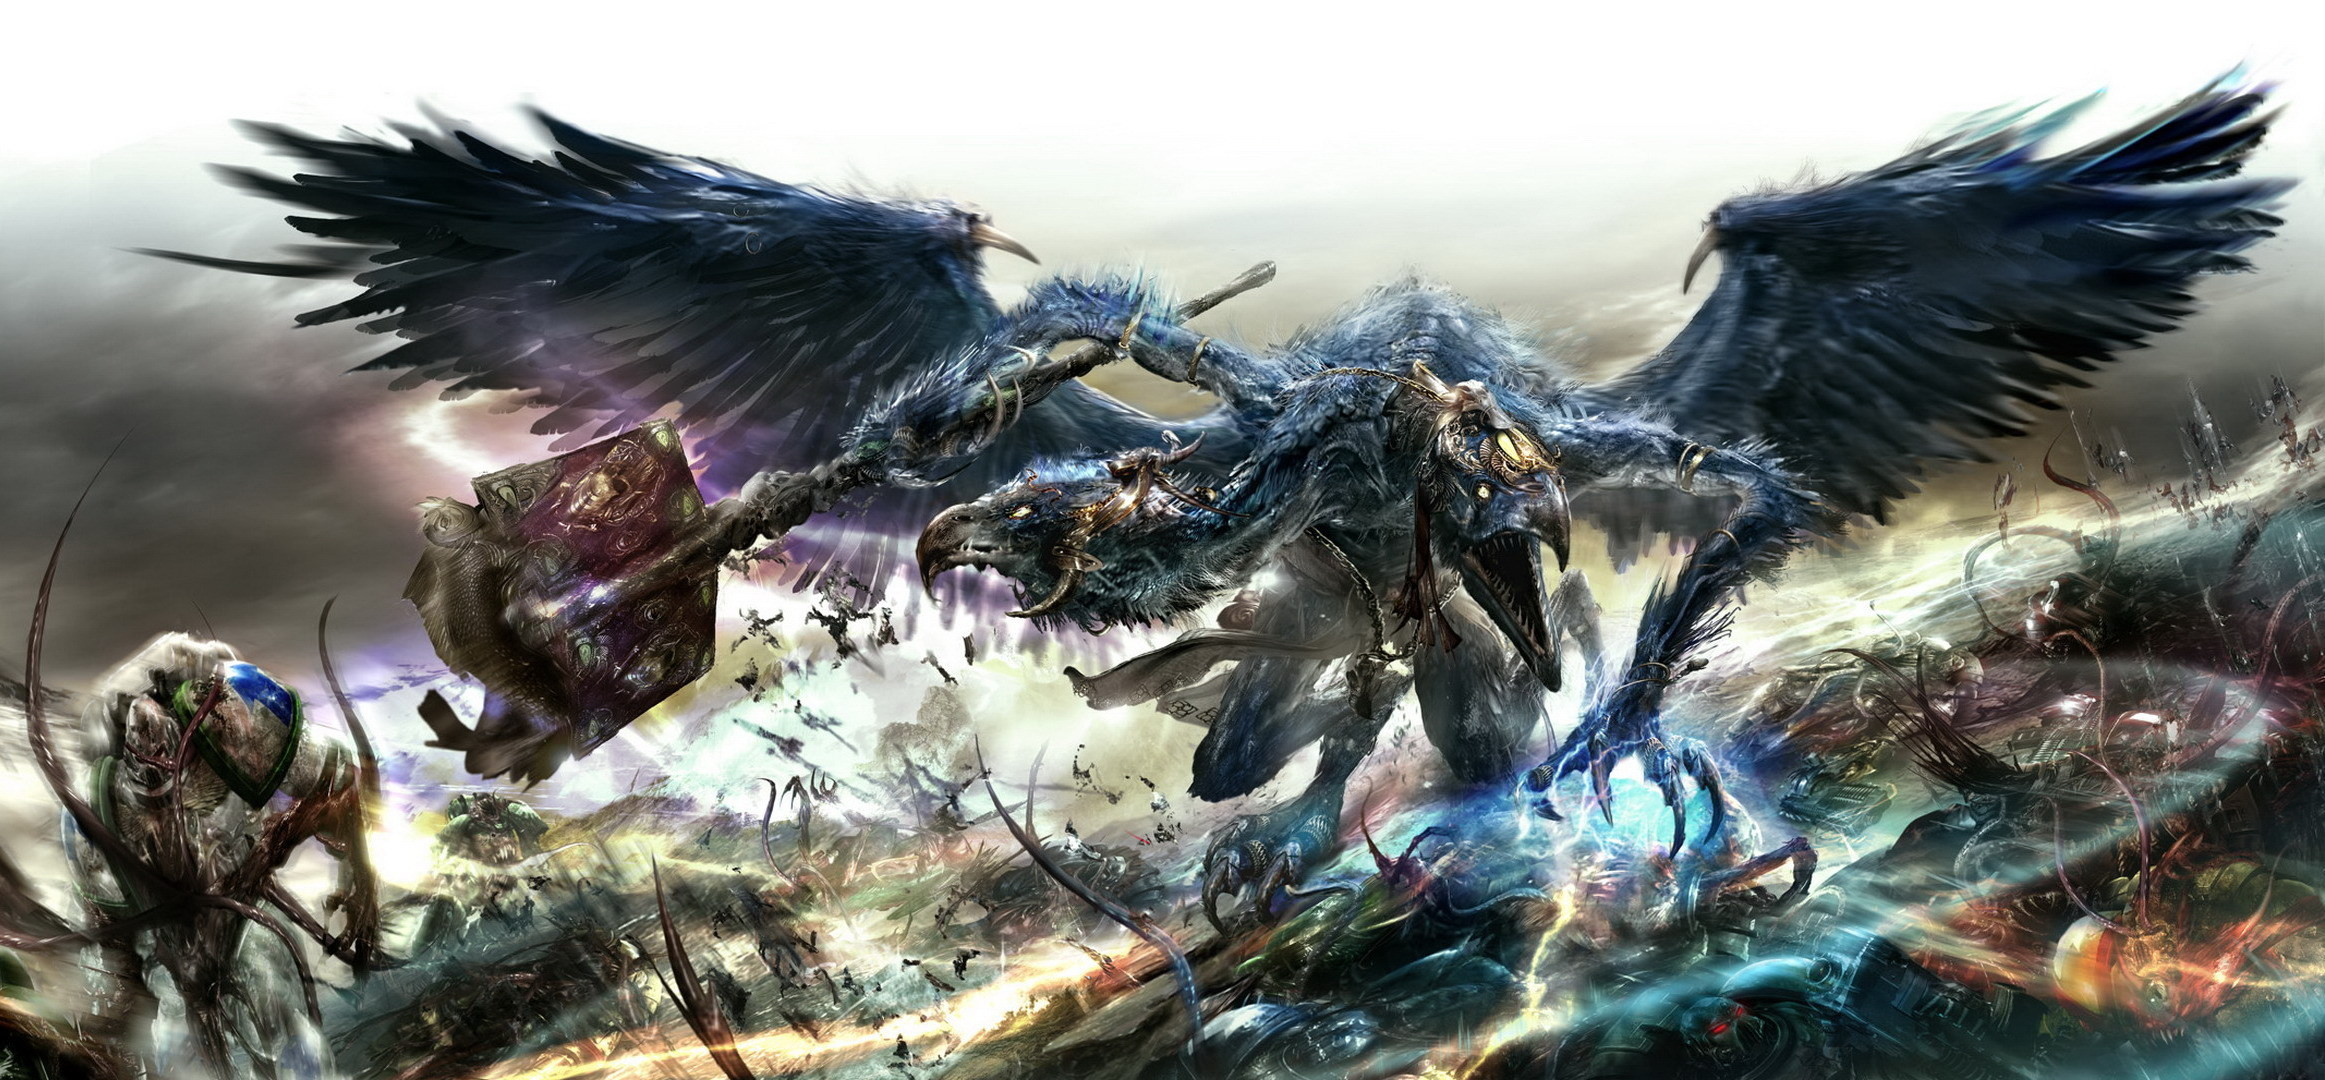 Warhammer 40k, battle, space marines, chaos, demon, tzeentch, tzeentch .